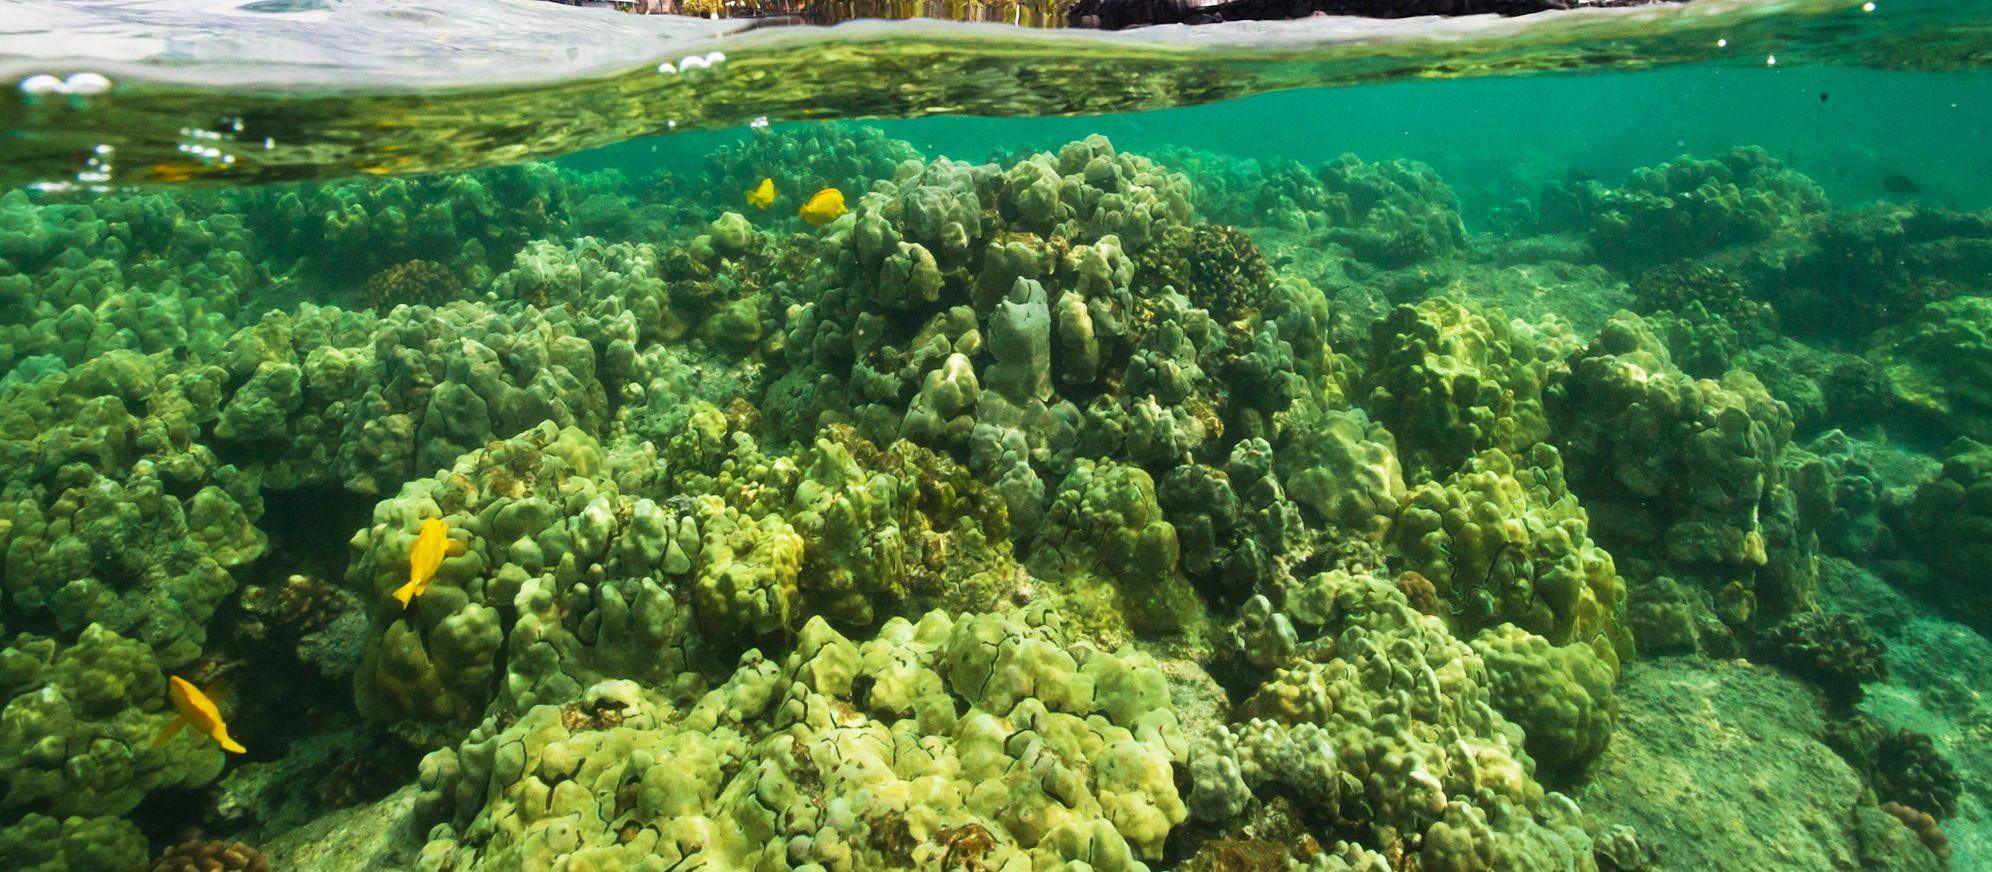 Korallen beim Hale o Keawe Heiau Tempel an der Kealakekua Bay, Big Island